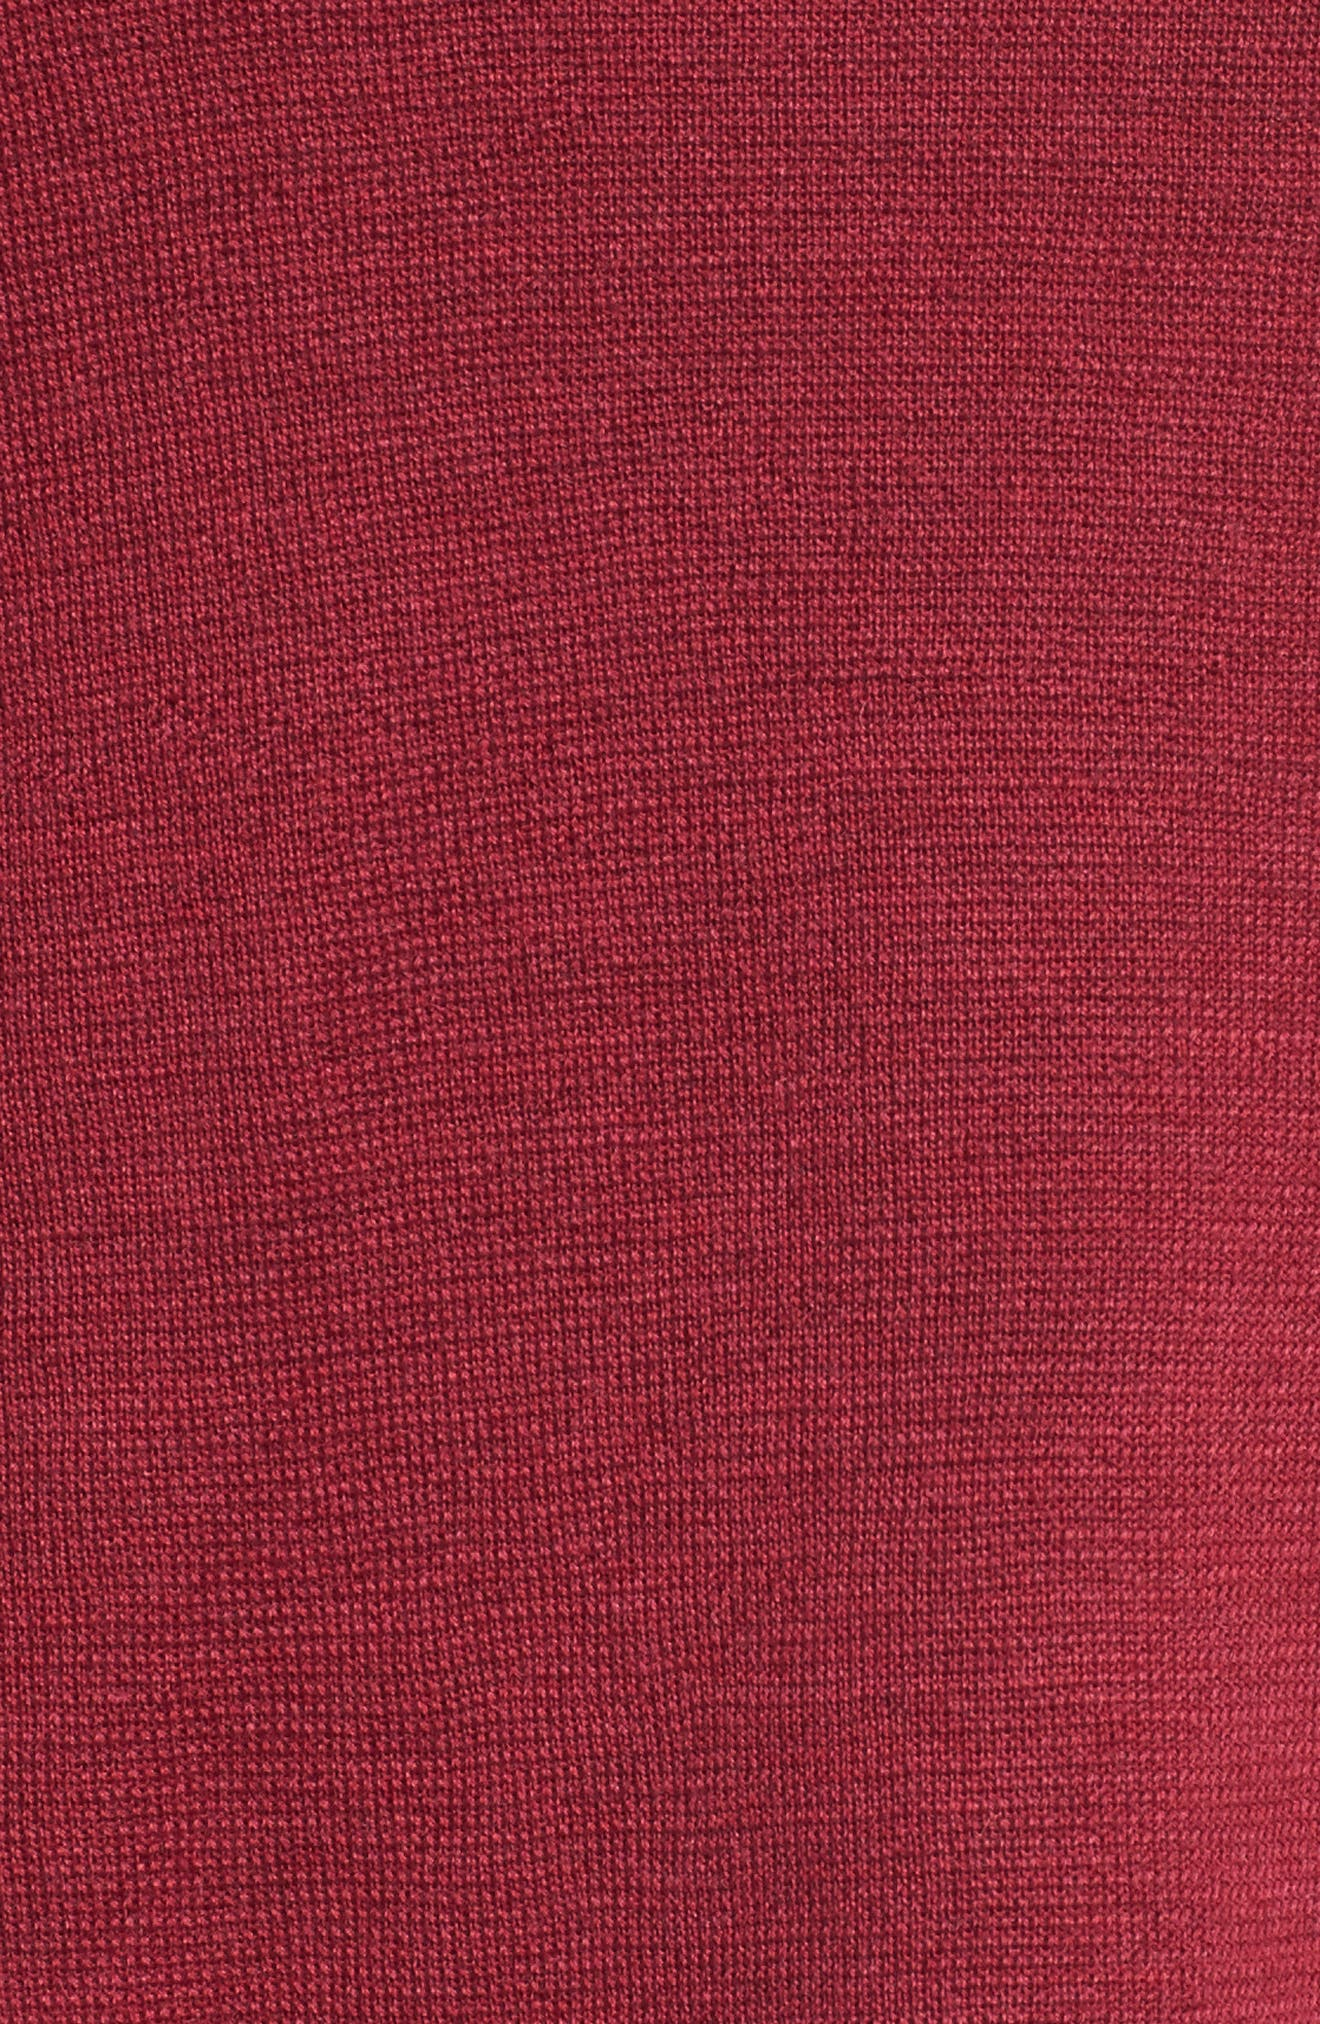 Alternate Image 5  - Eileen Fisher Merino Wool Sweater Dress (Plus Size)